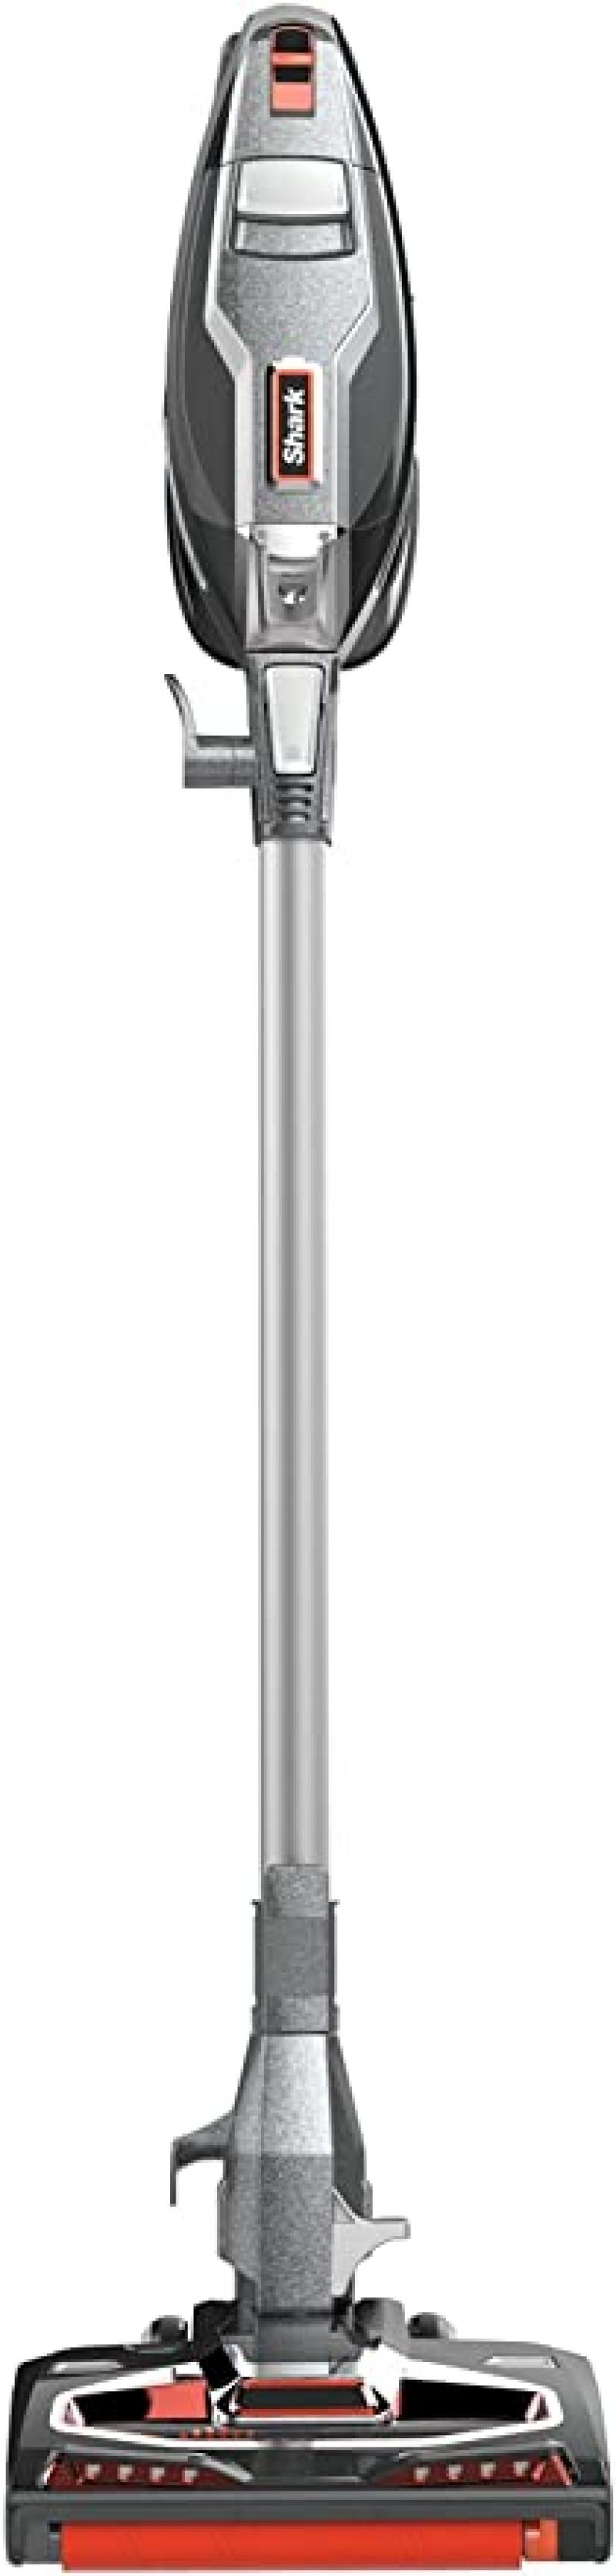 ihocon: Shark HV382 Rocket DuoClean Ultra-Light Corded Bagless Carpet and Hard Floor with Hand Vacuum 無袋吸塵器